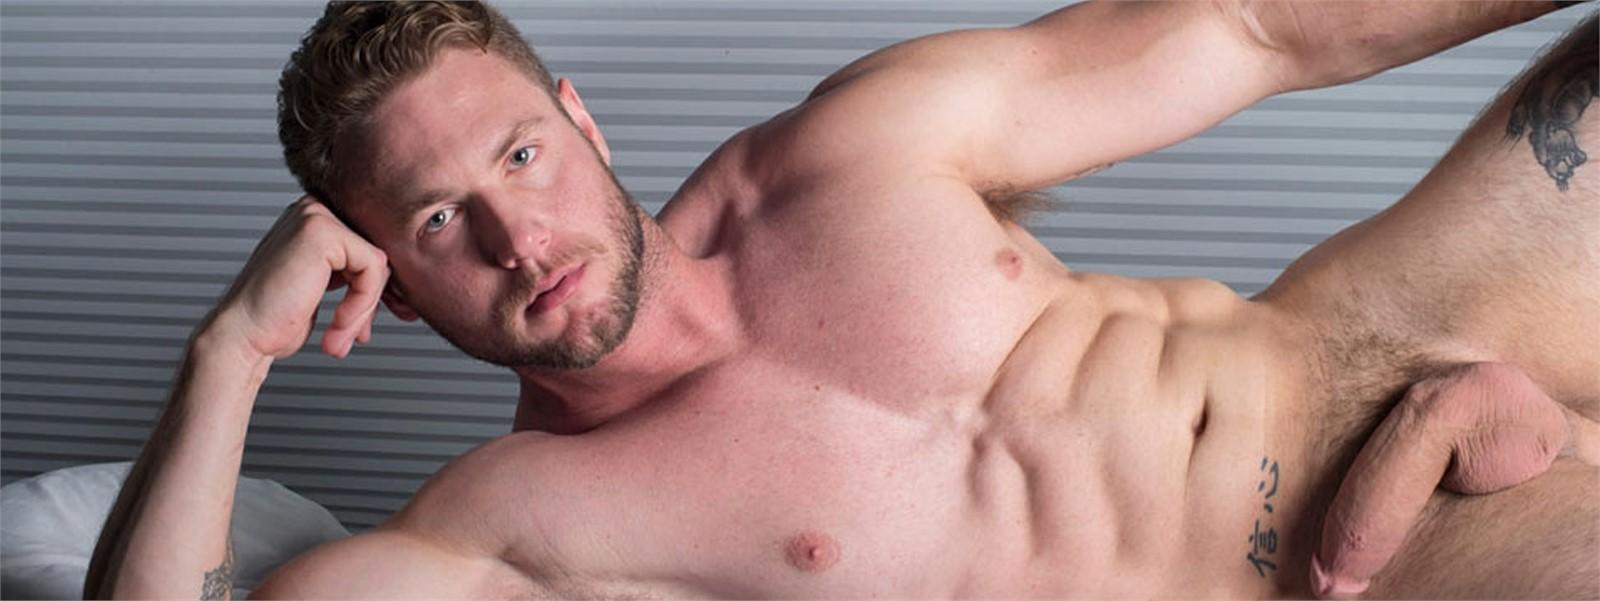 Actor Porno Milan Gamiani gay porn videos, dvds & sex toys @ gay dvd empire